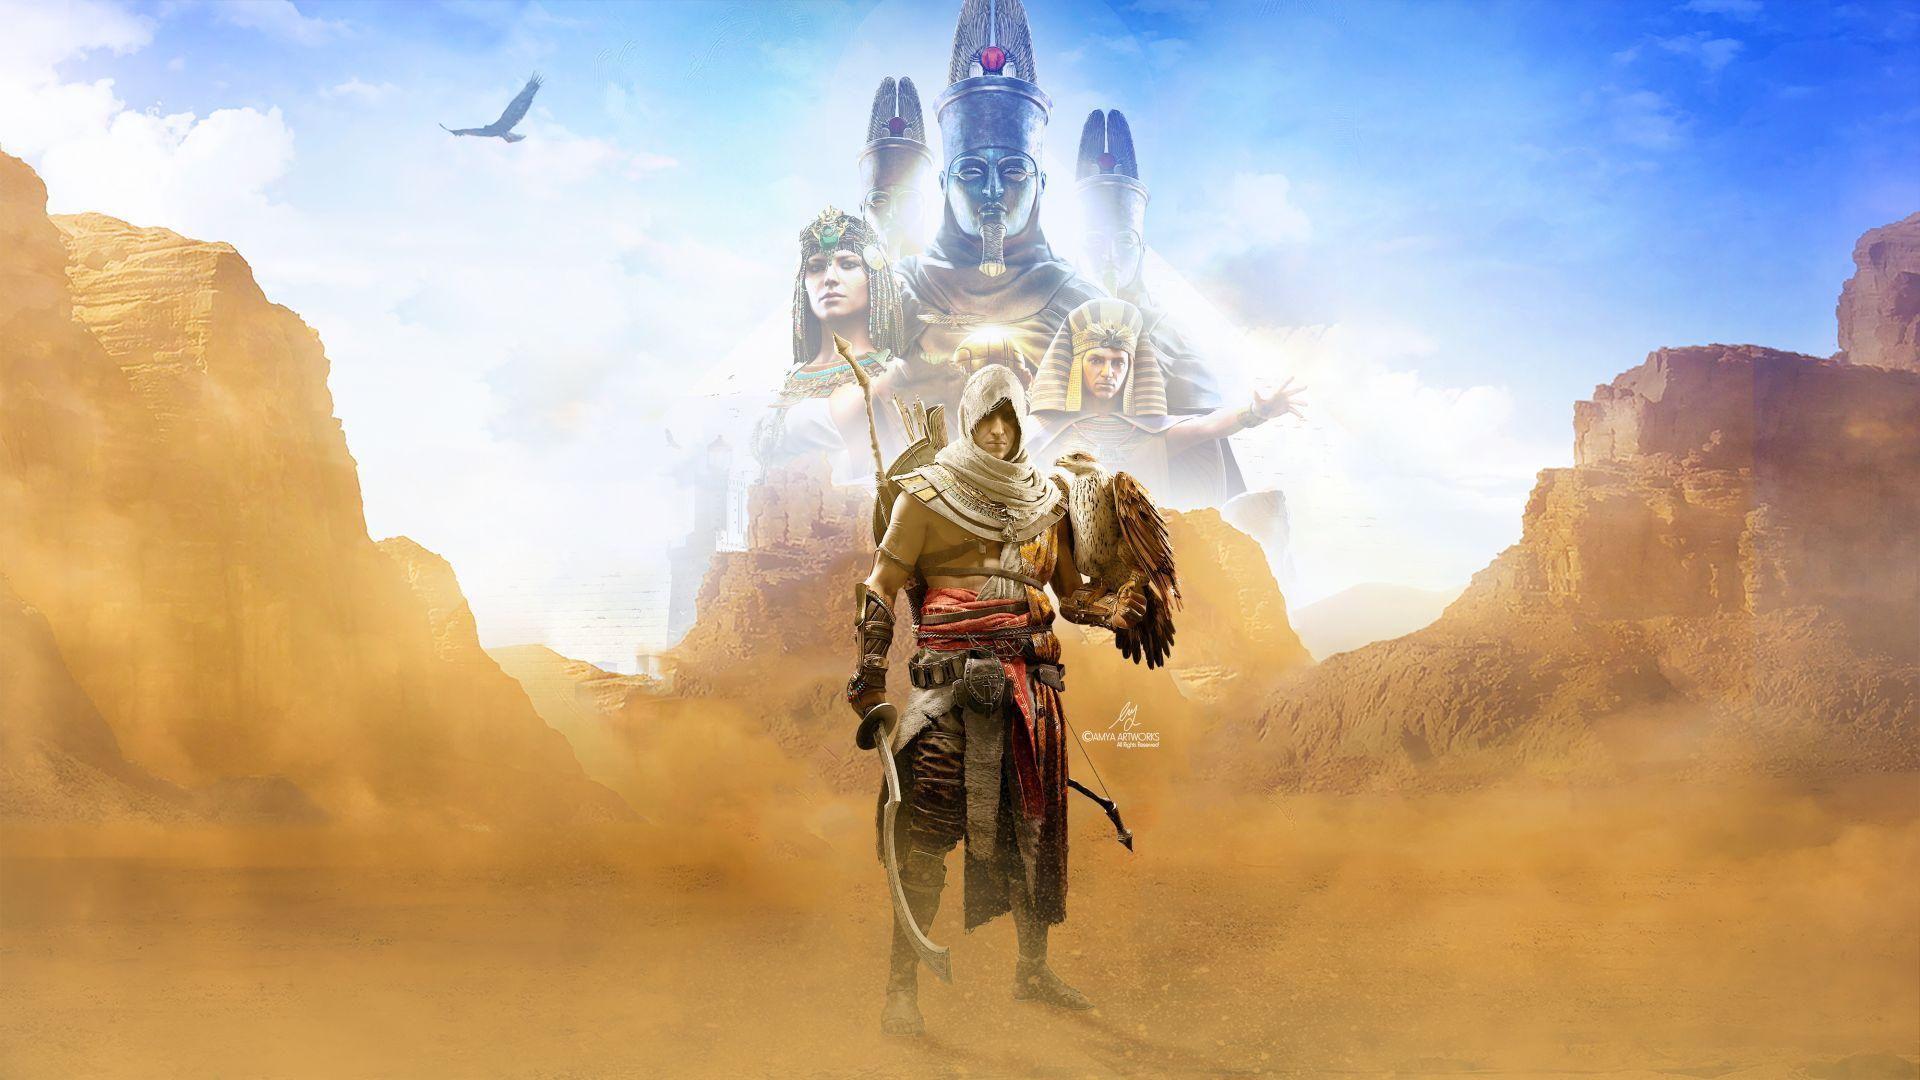 Bayek Assassin S Creed Origins Artwork 4k Assassins Creed Movie Assassins Creed Origins Assassins Creed